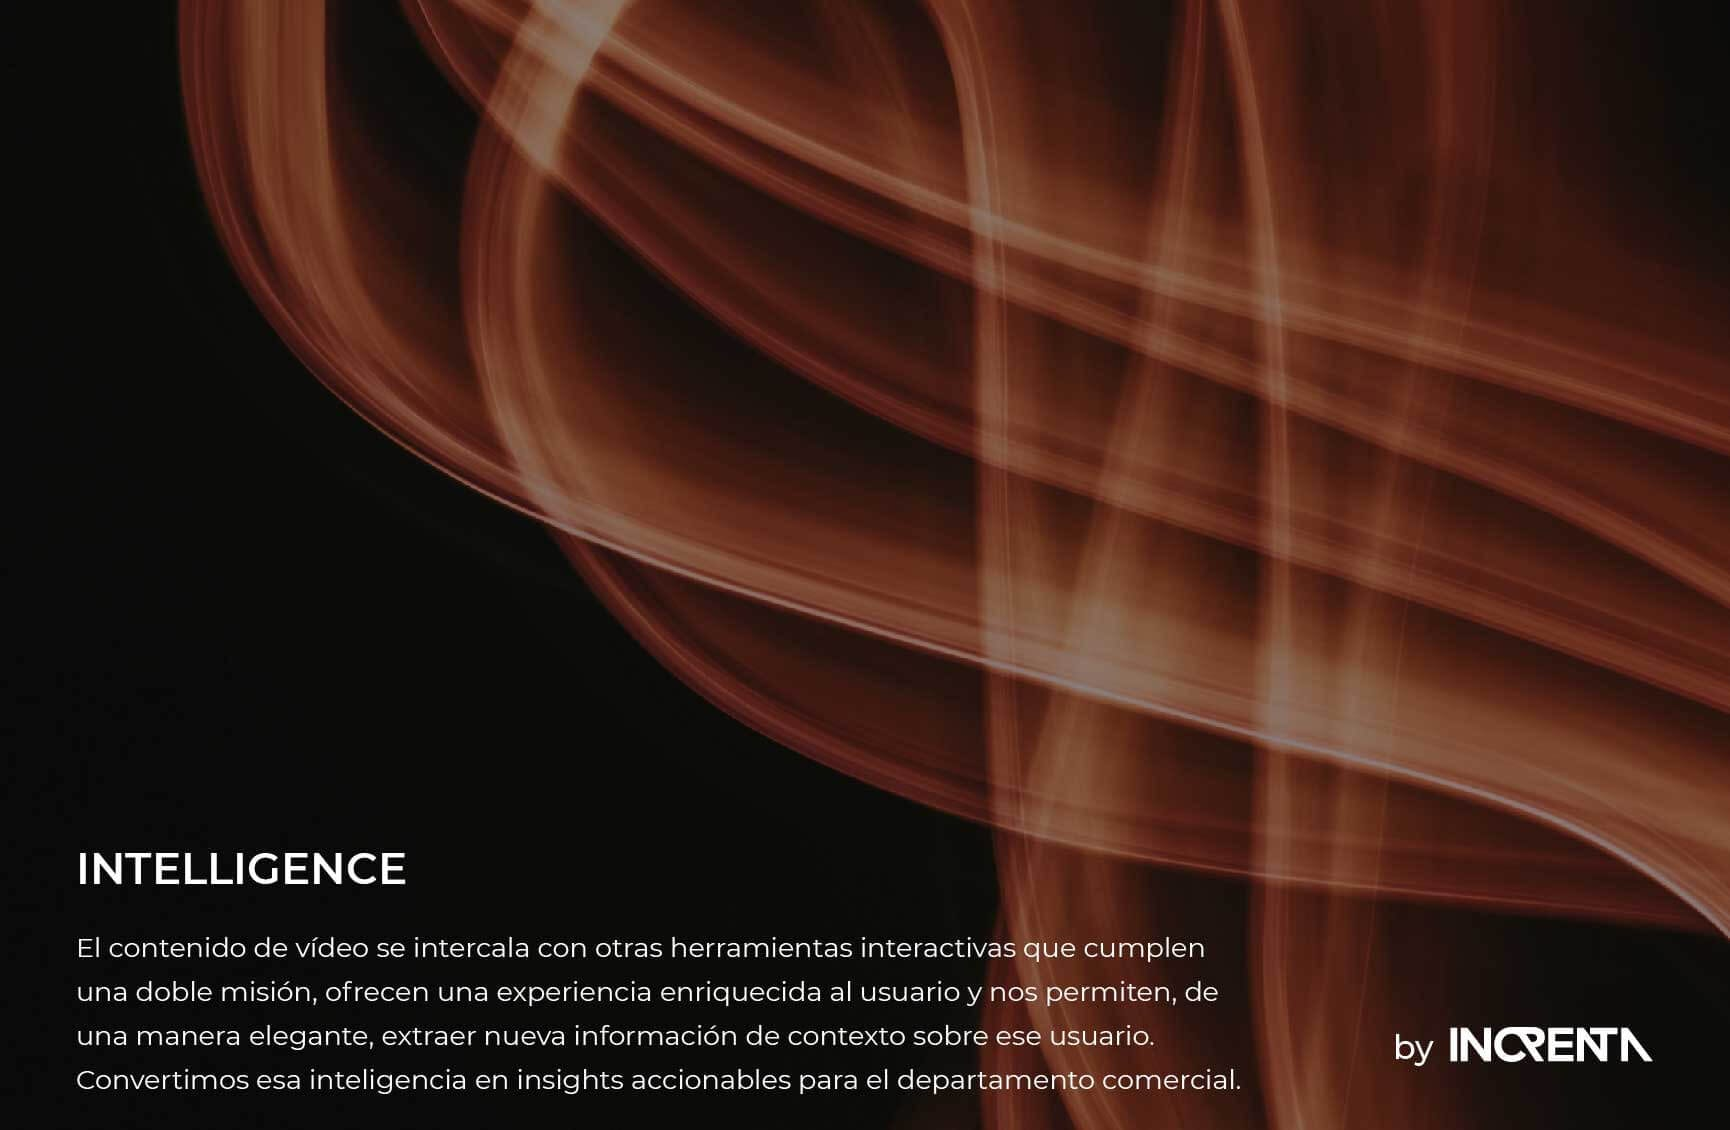 Soluciones Increnta_Corporate academy 4